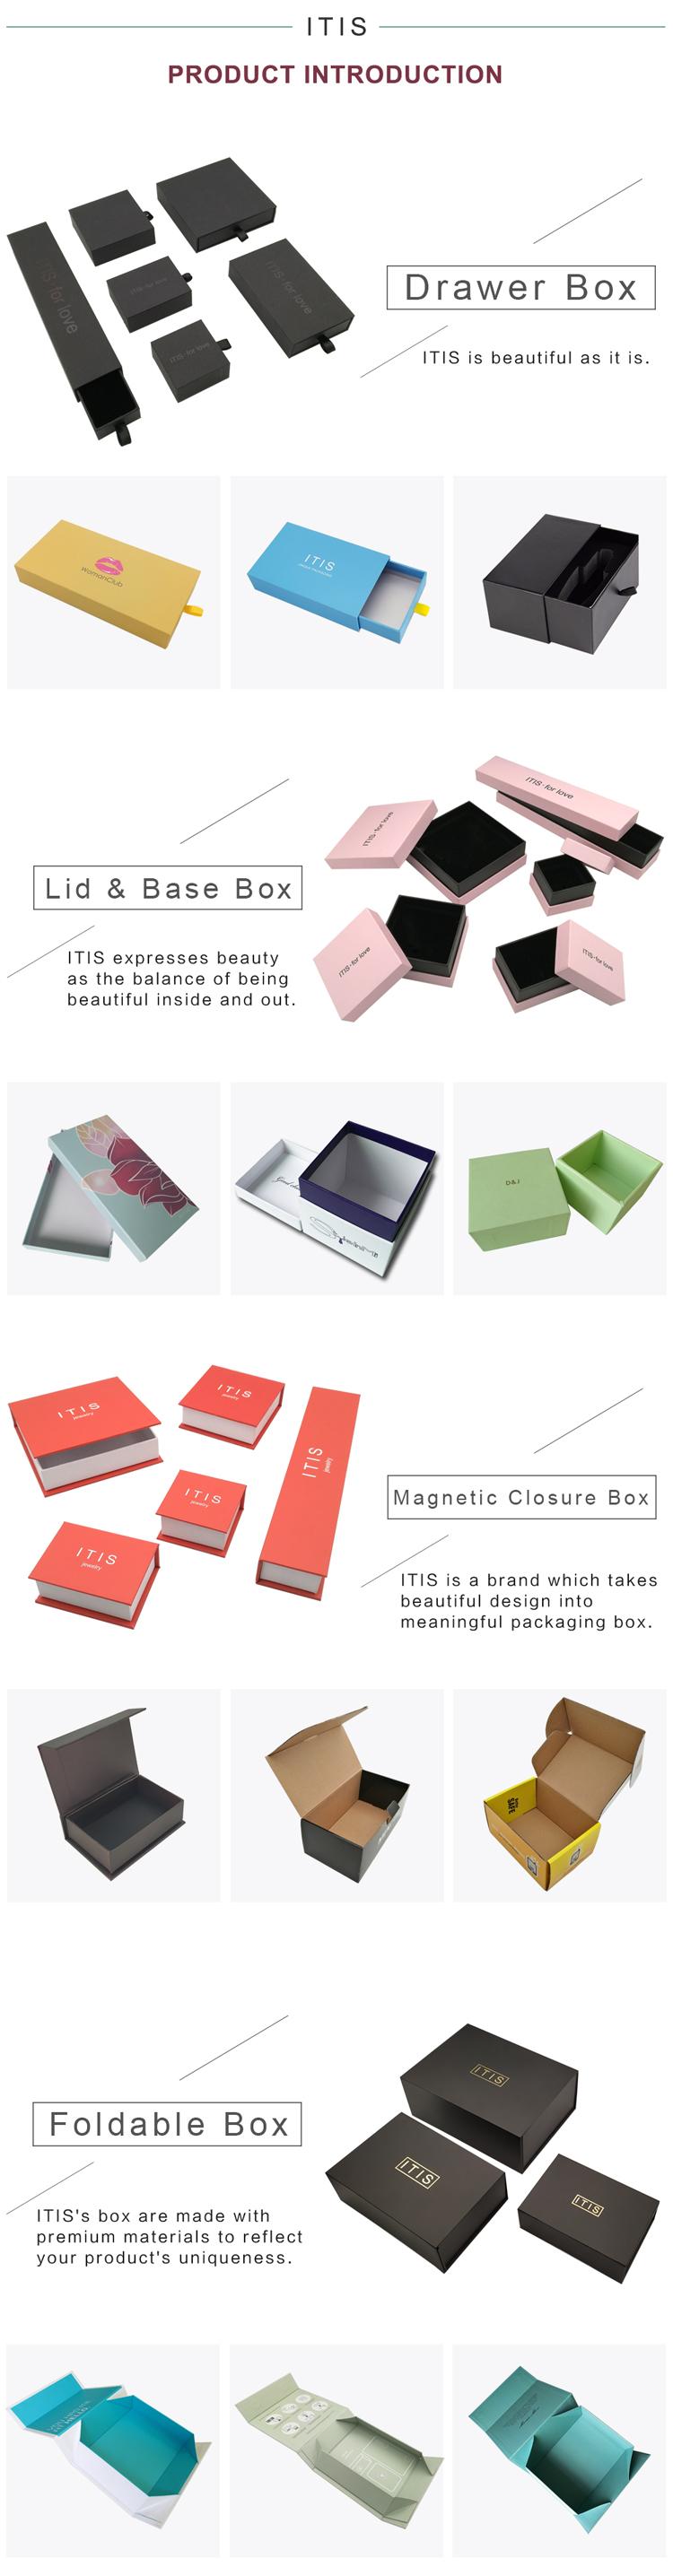 Printed-Box.jpg